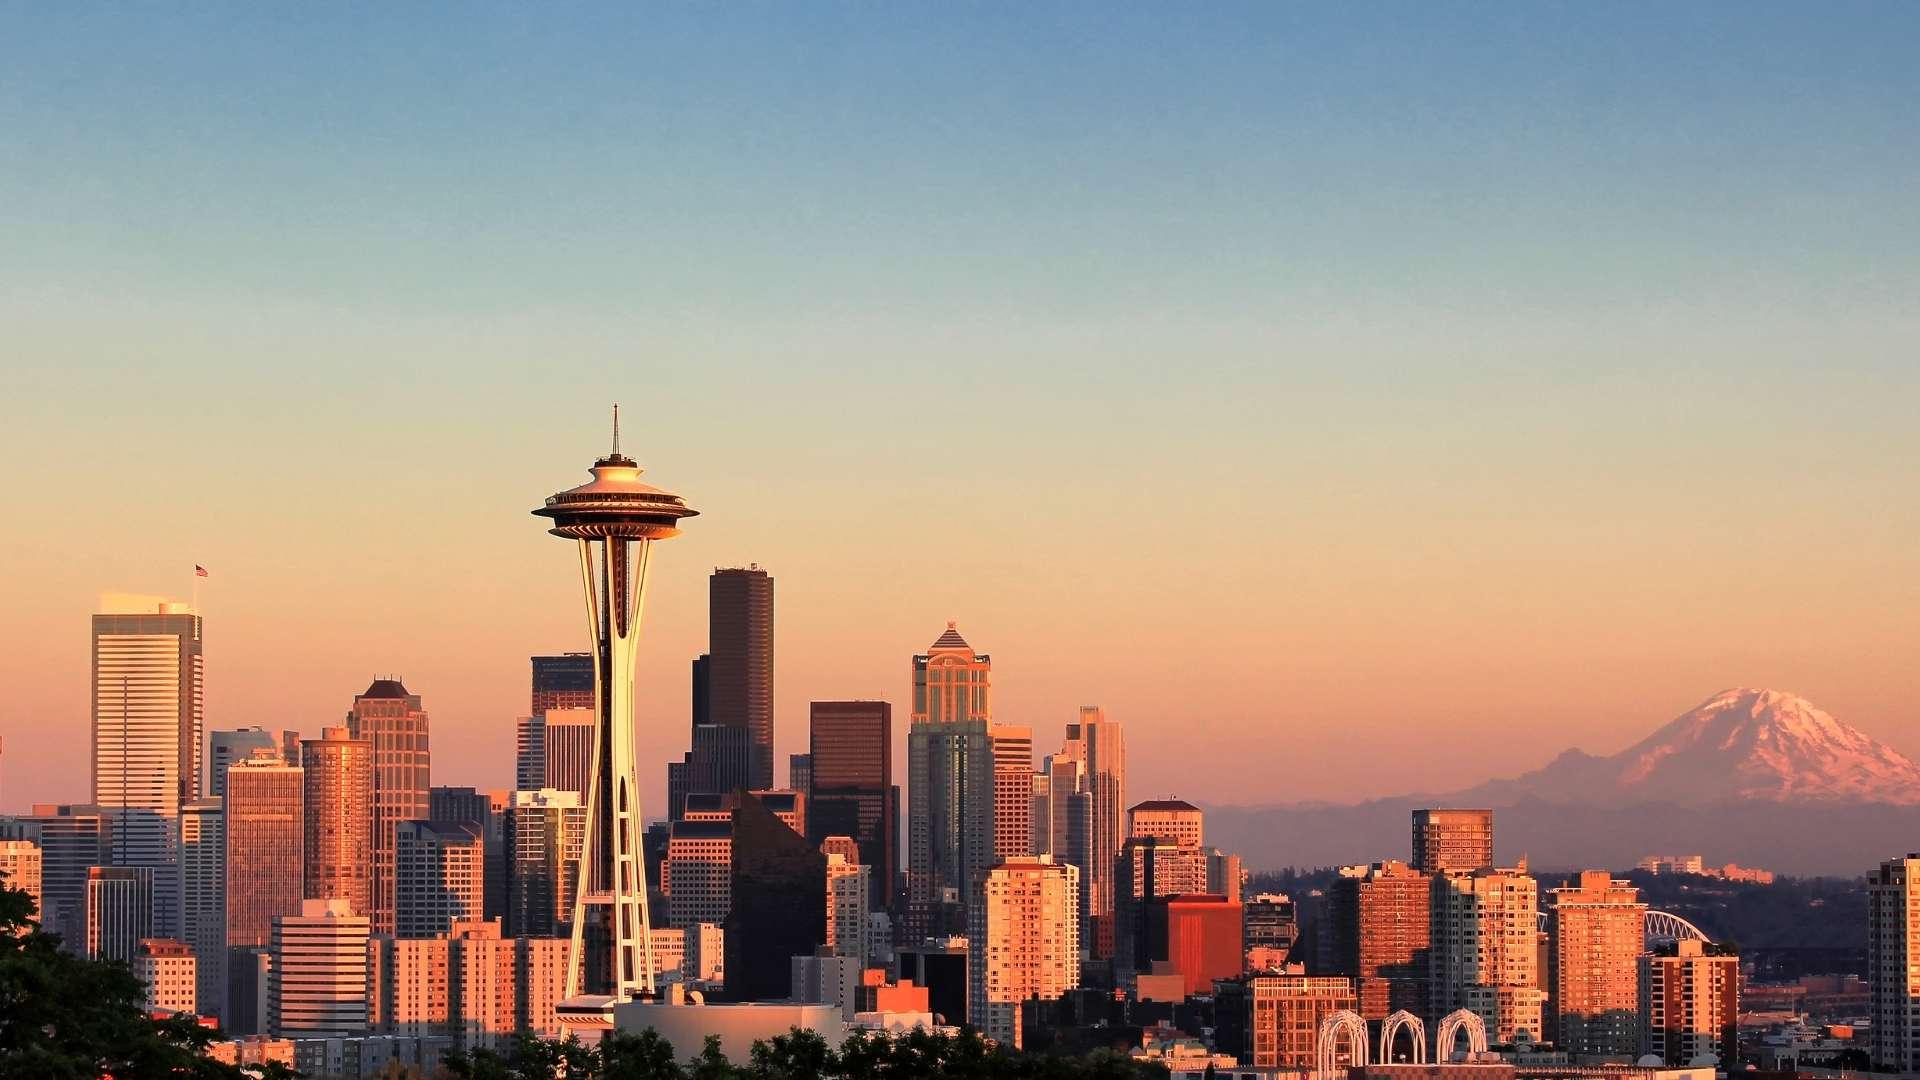 City_Skyline_Seattle_Washington_1920x1080.jpg